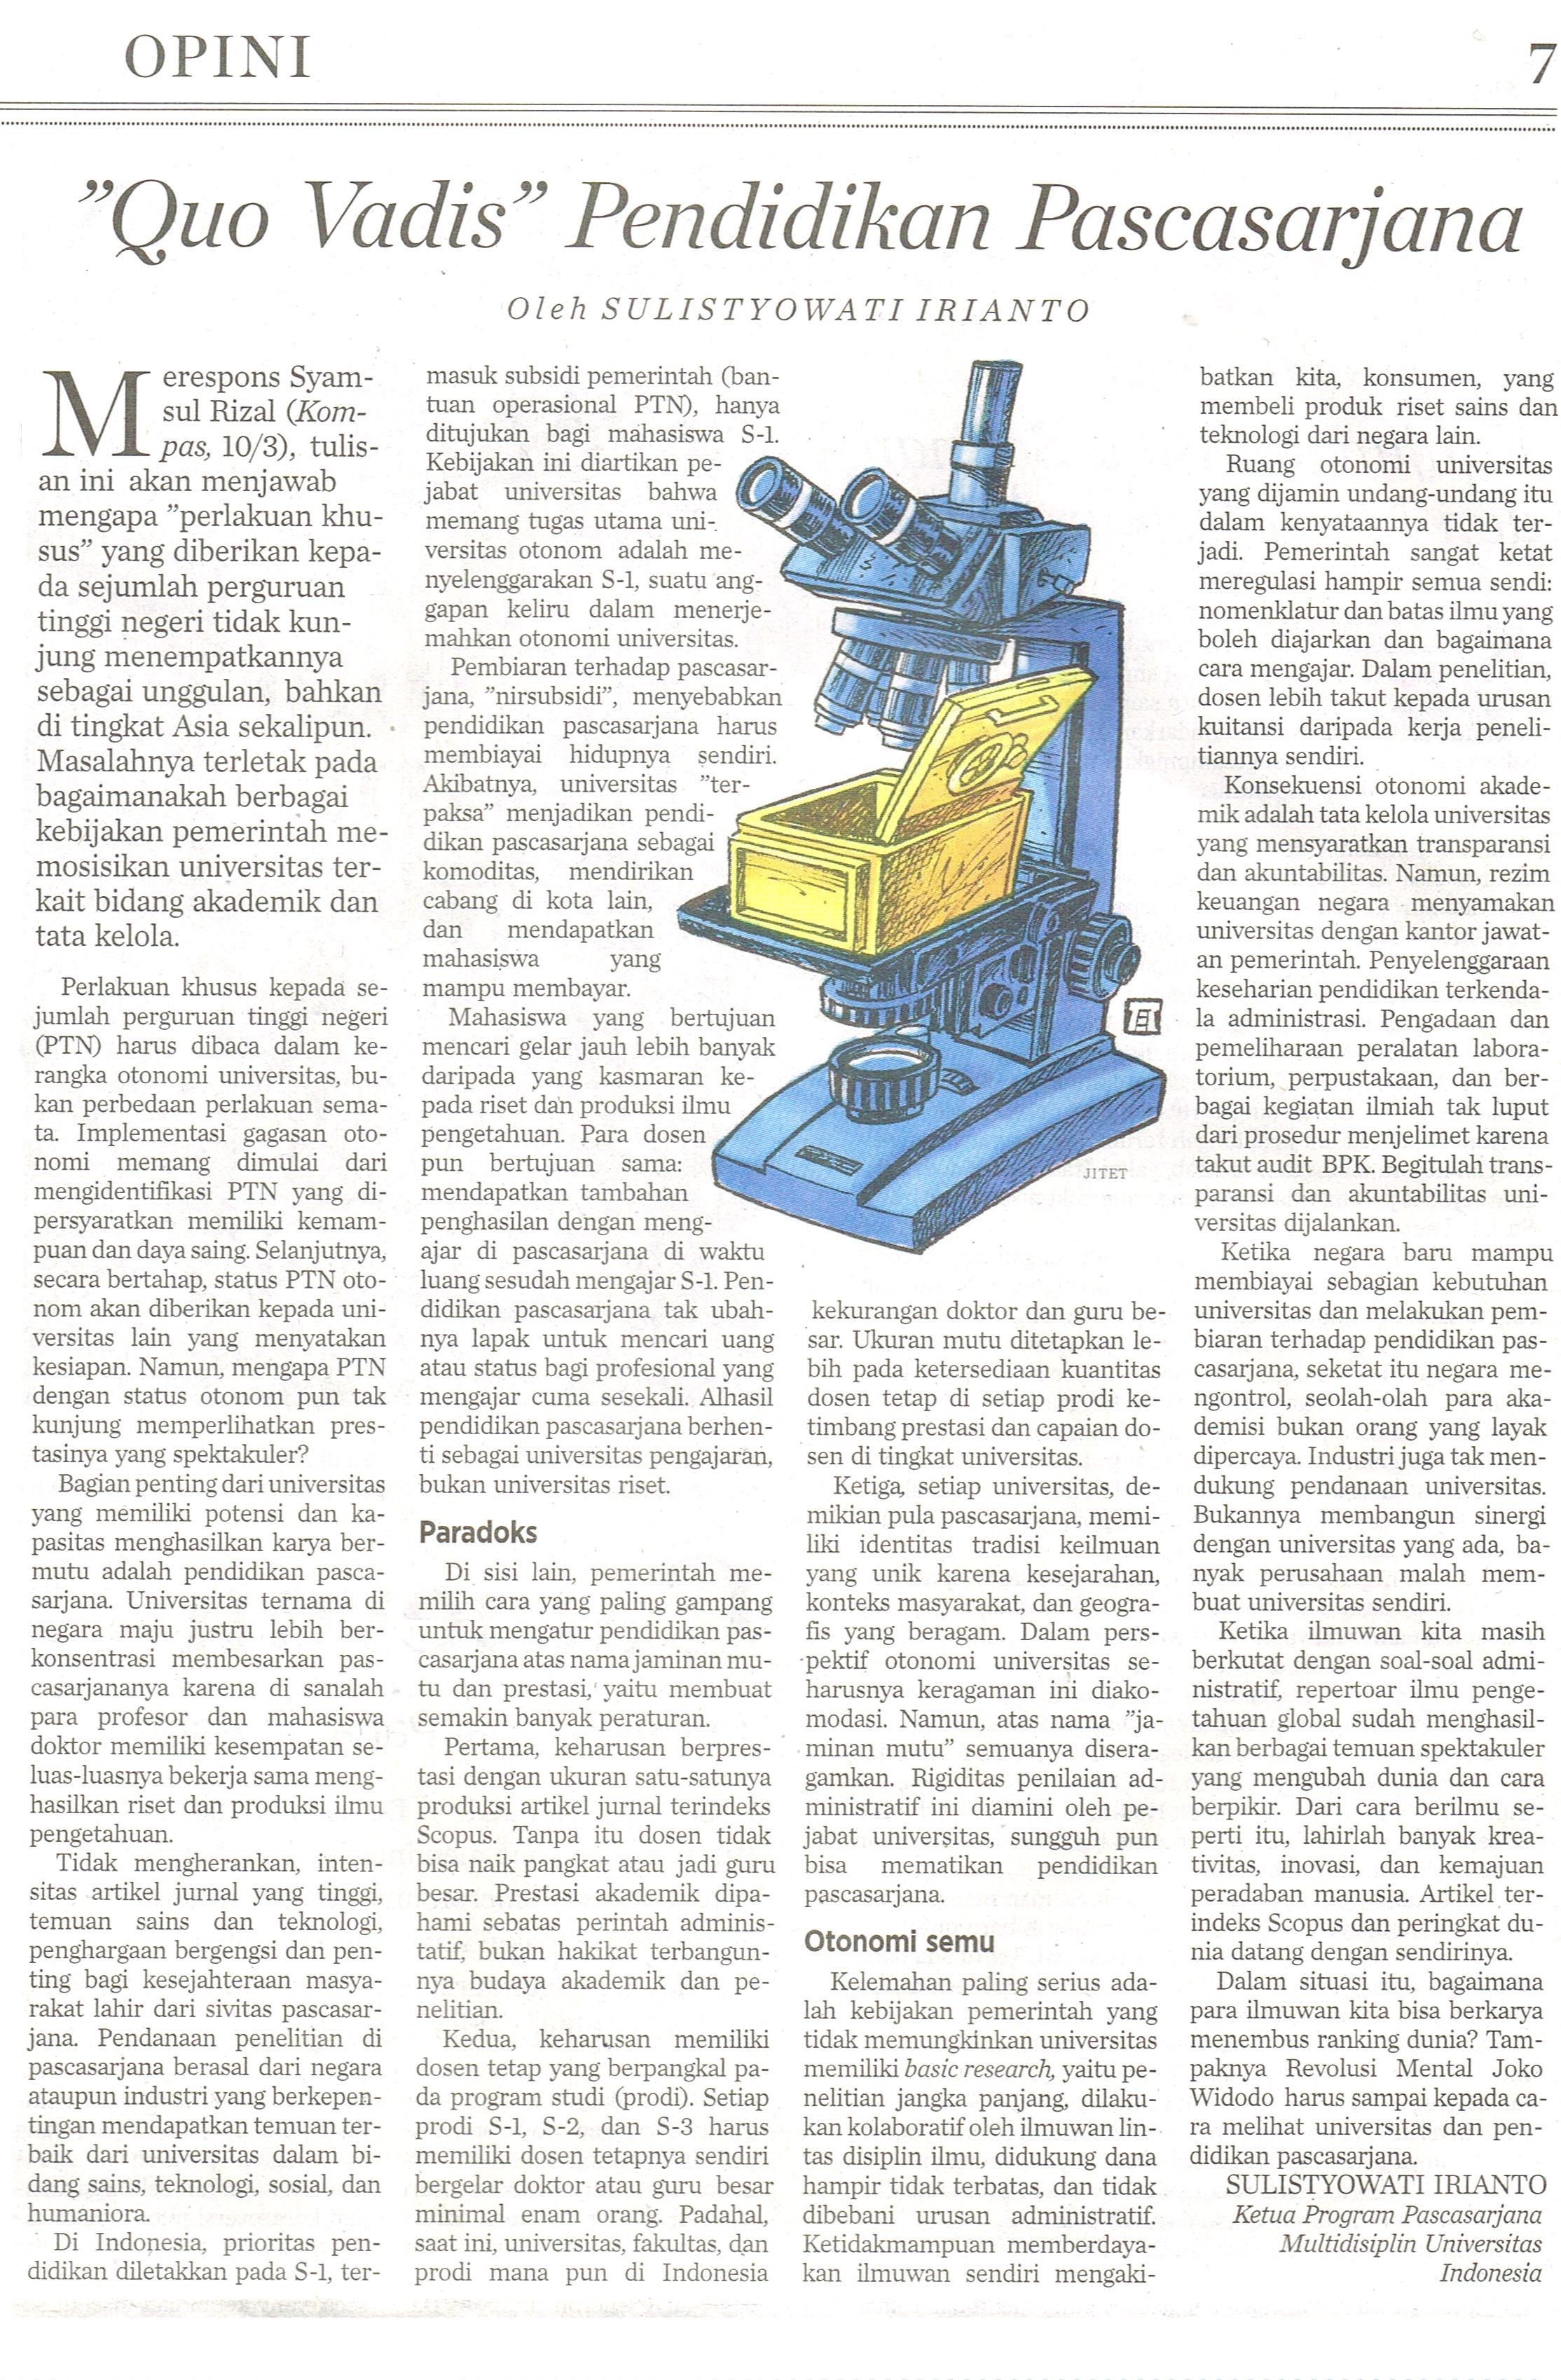 Quo Vadis Pendidikan Pascasarjana. Kompas.11 April 2016.Hal.7